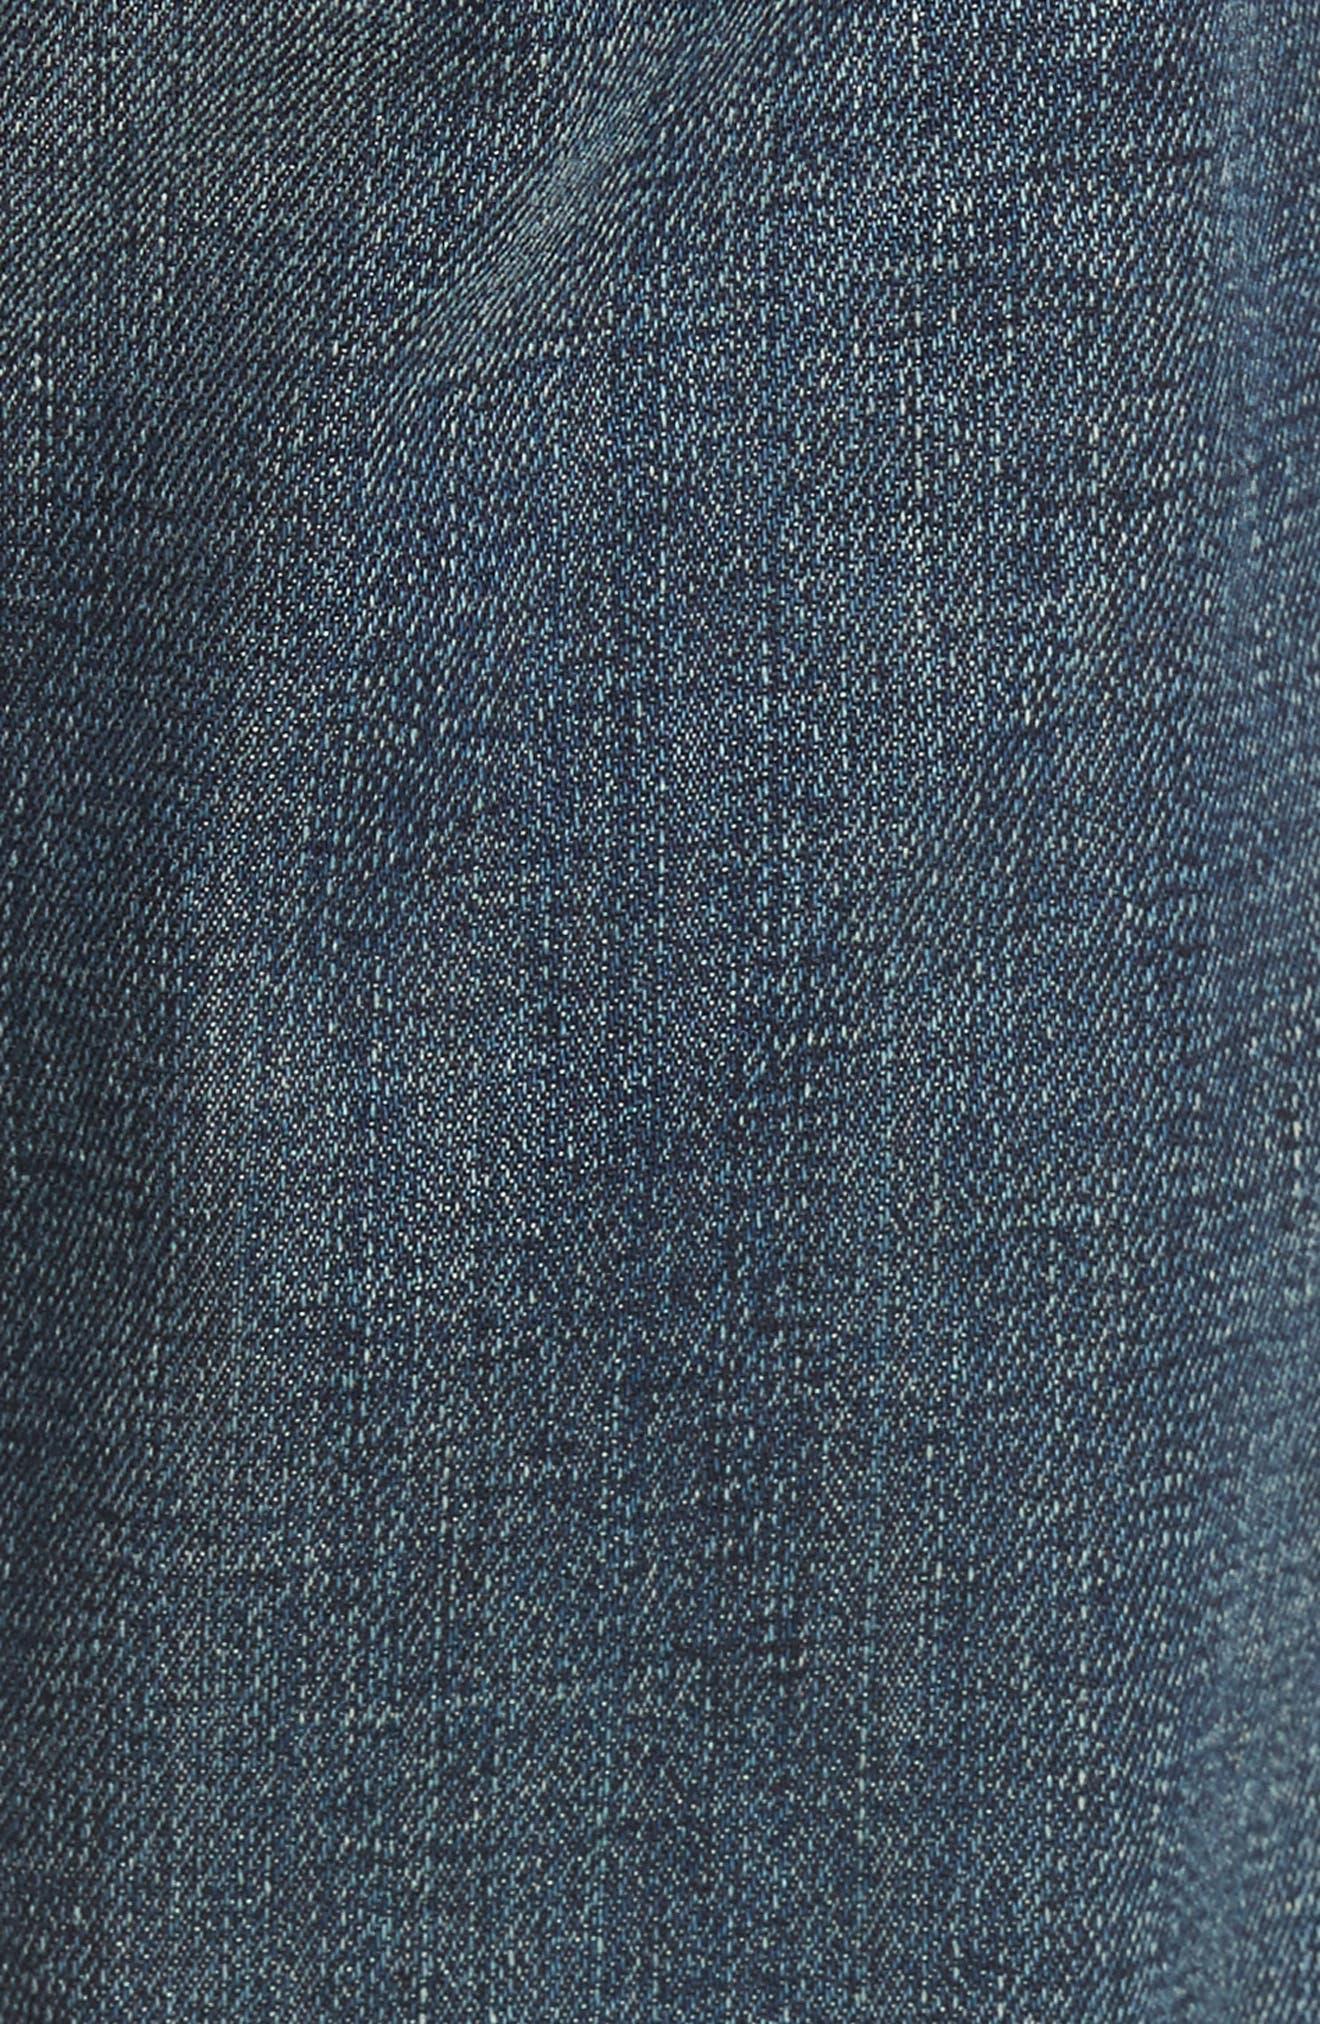 Fideltiy Denim Torino Slim Fit Jeans,                             Alternate thumbnail 5, color,                             Crystal Blue